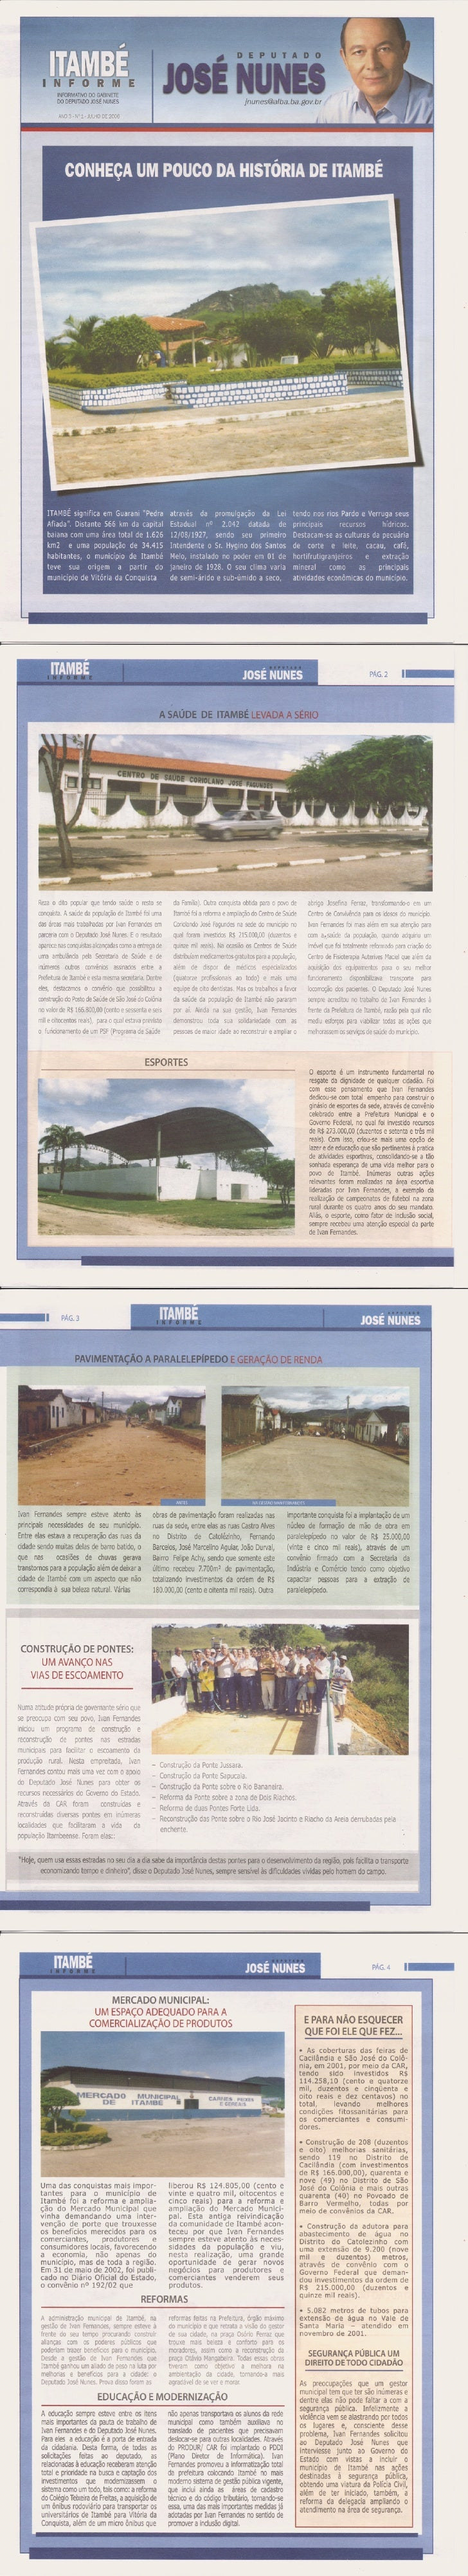 Boletim Informativo sobre o município de Itambe